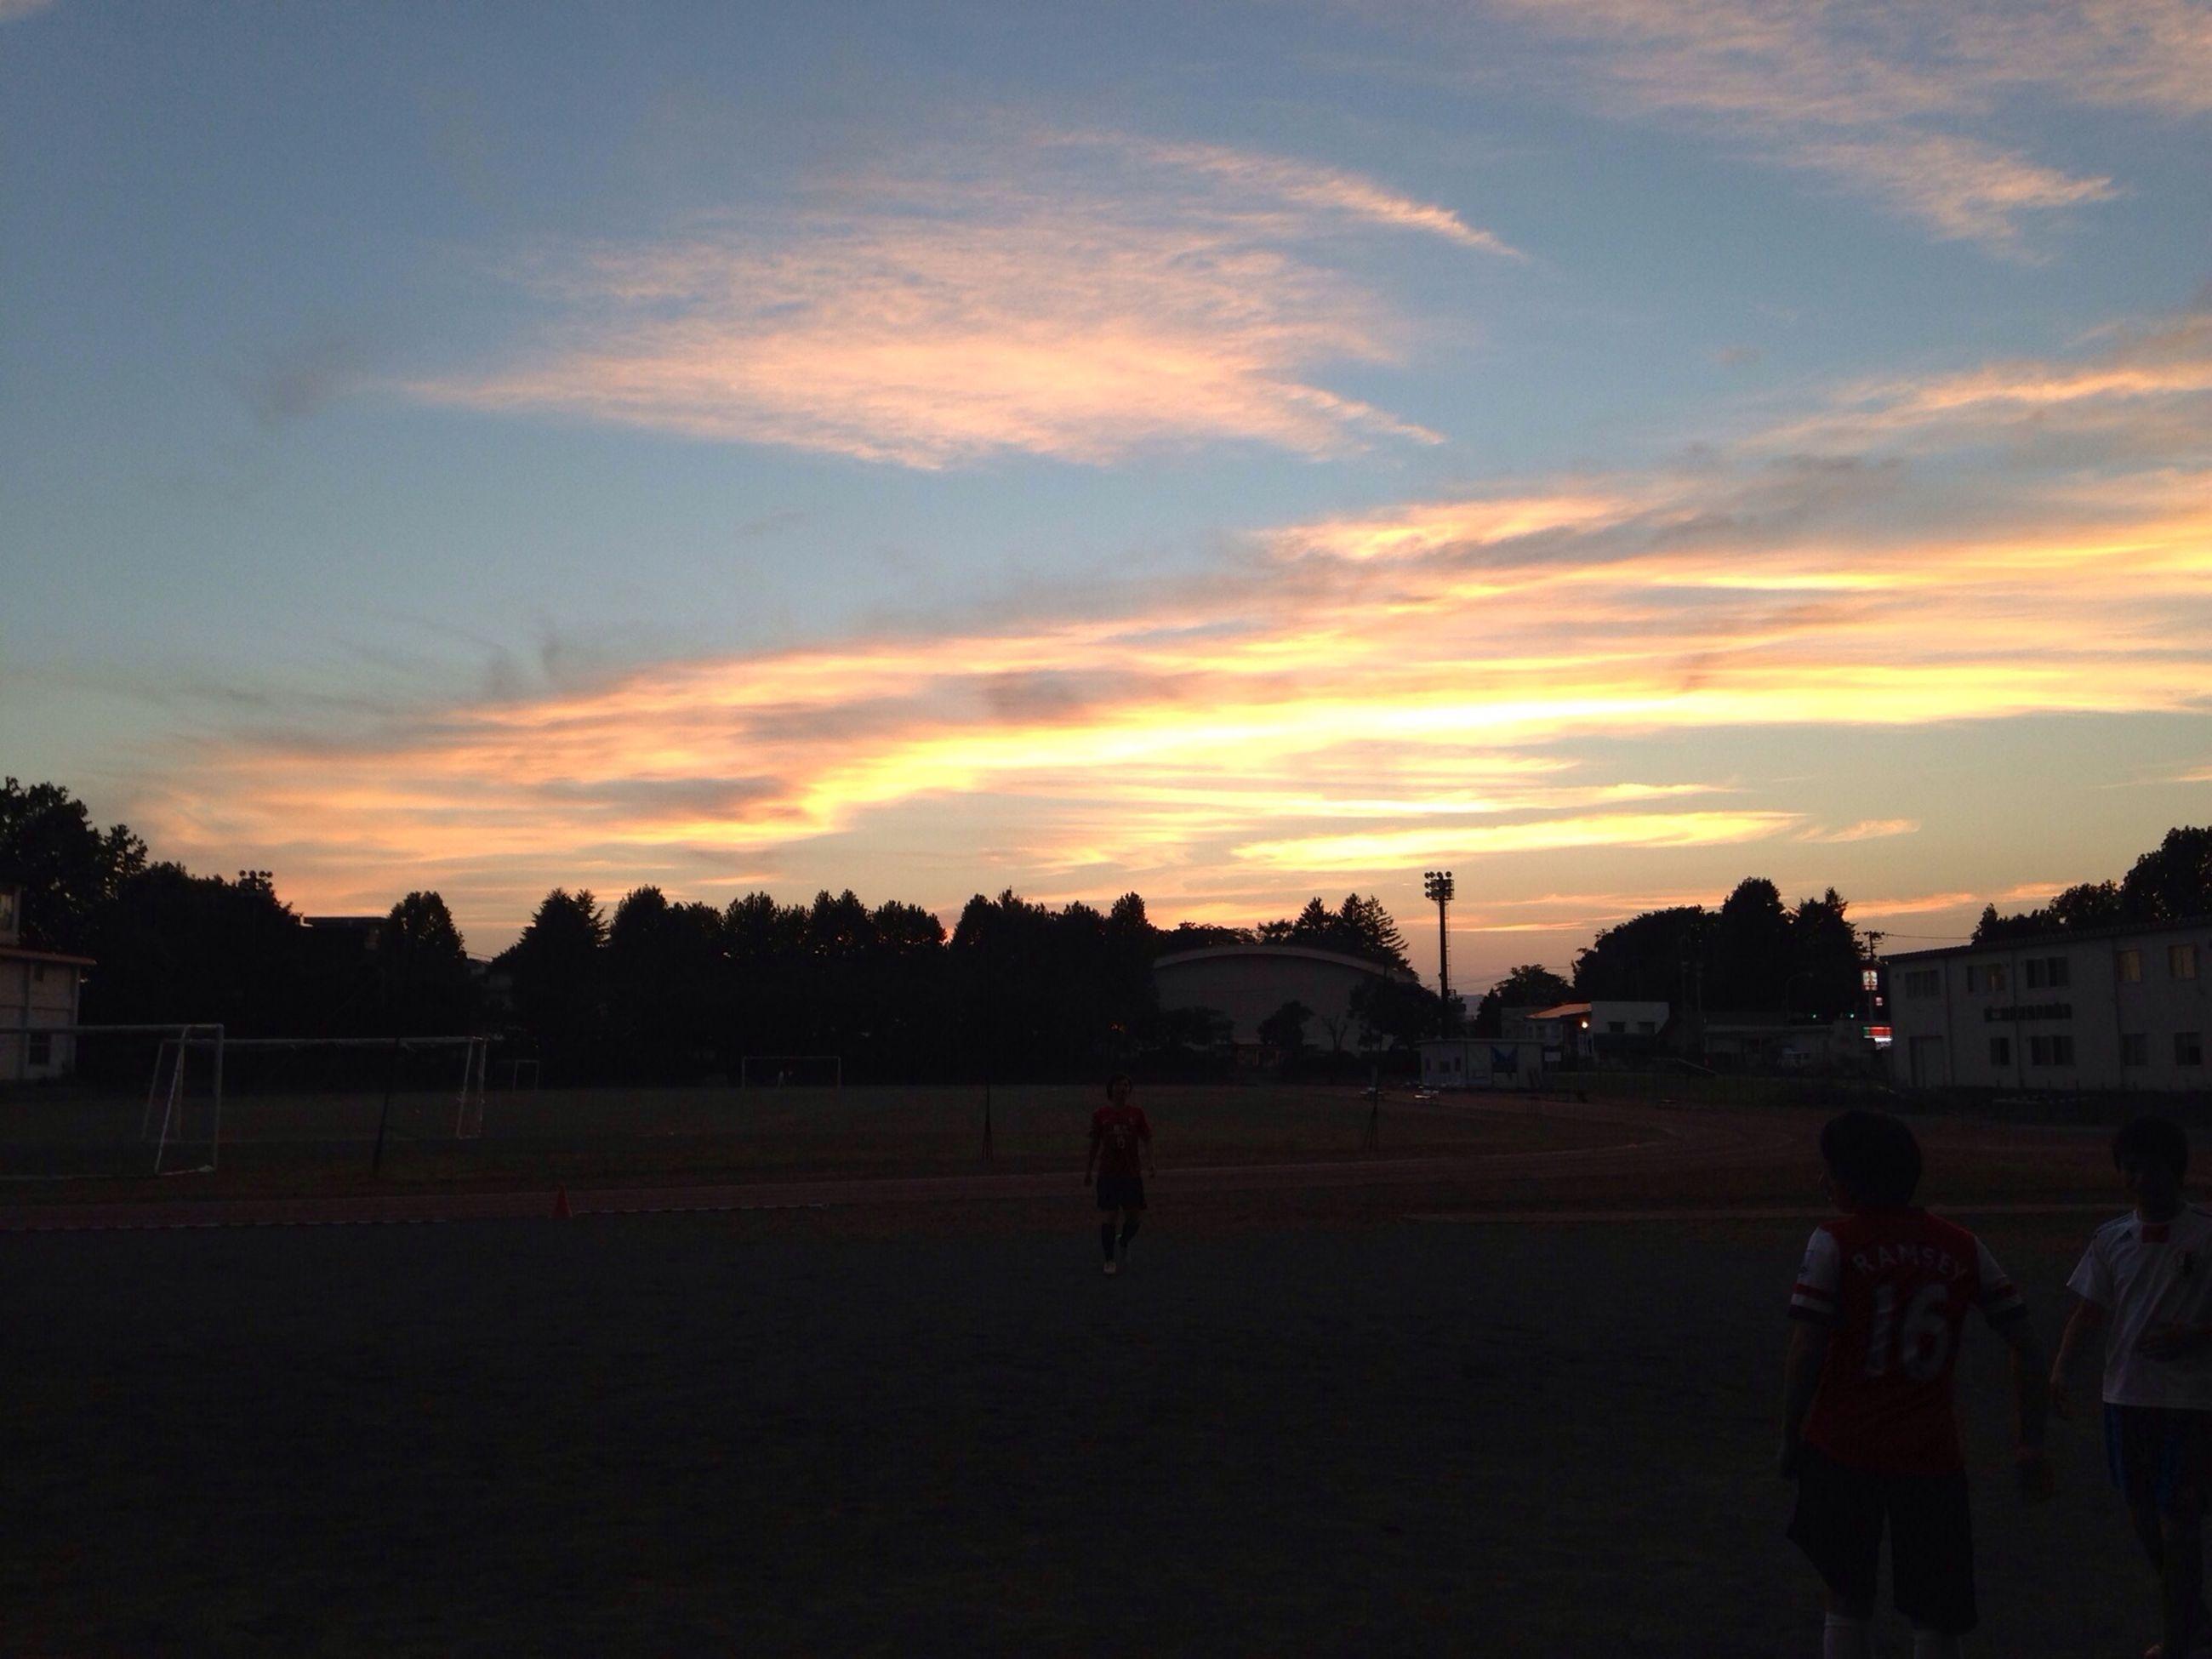 sunset, sky, lifestyles, men, silhouette, leisure activity, orange color, walking, person, cloud - sky, transportation, rear view, full length, street, outdoors, cloud, building exterior